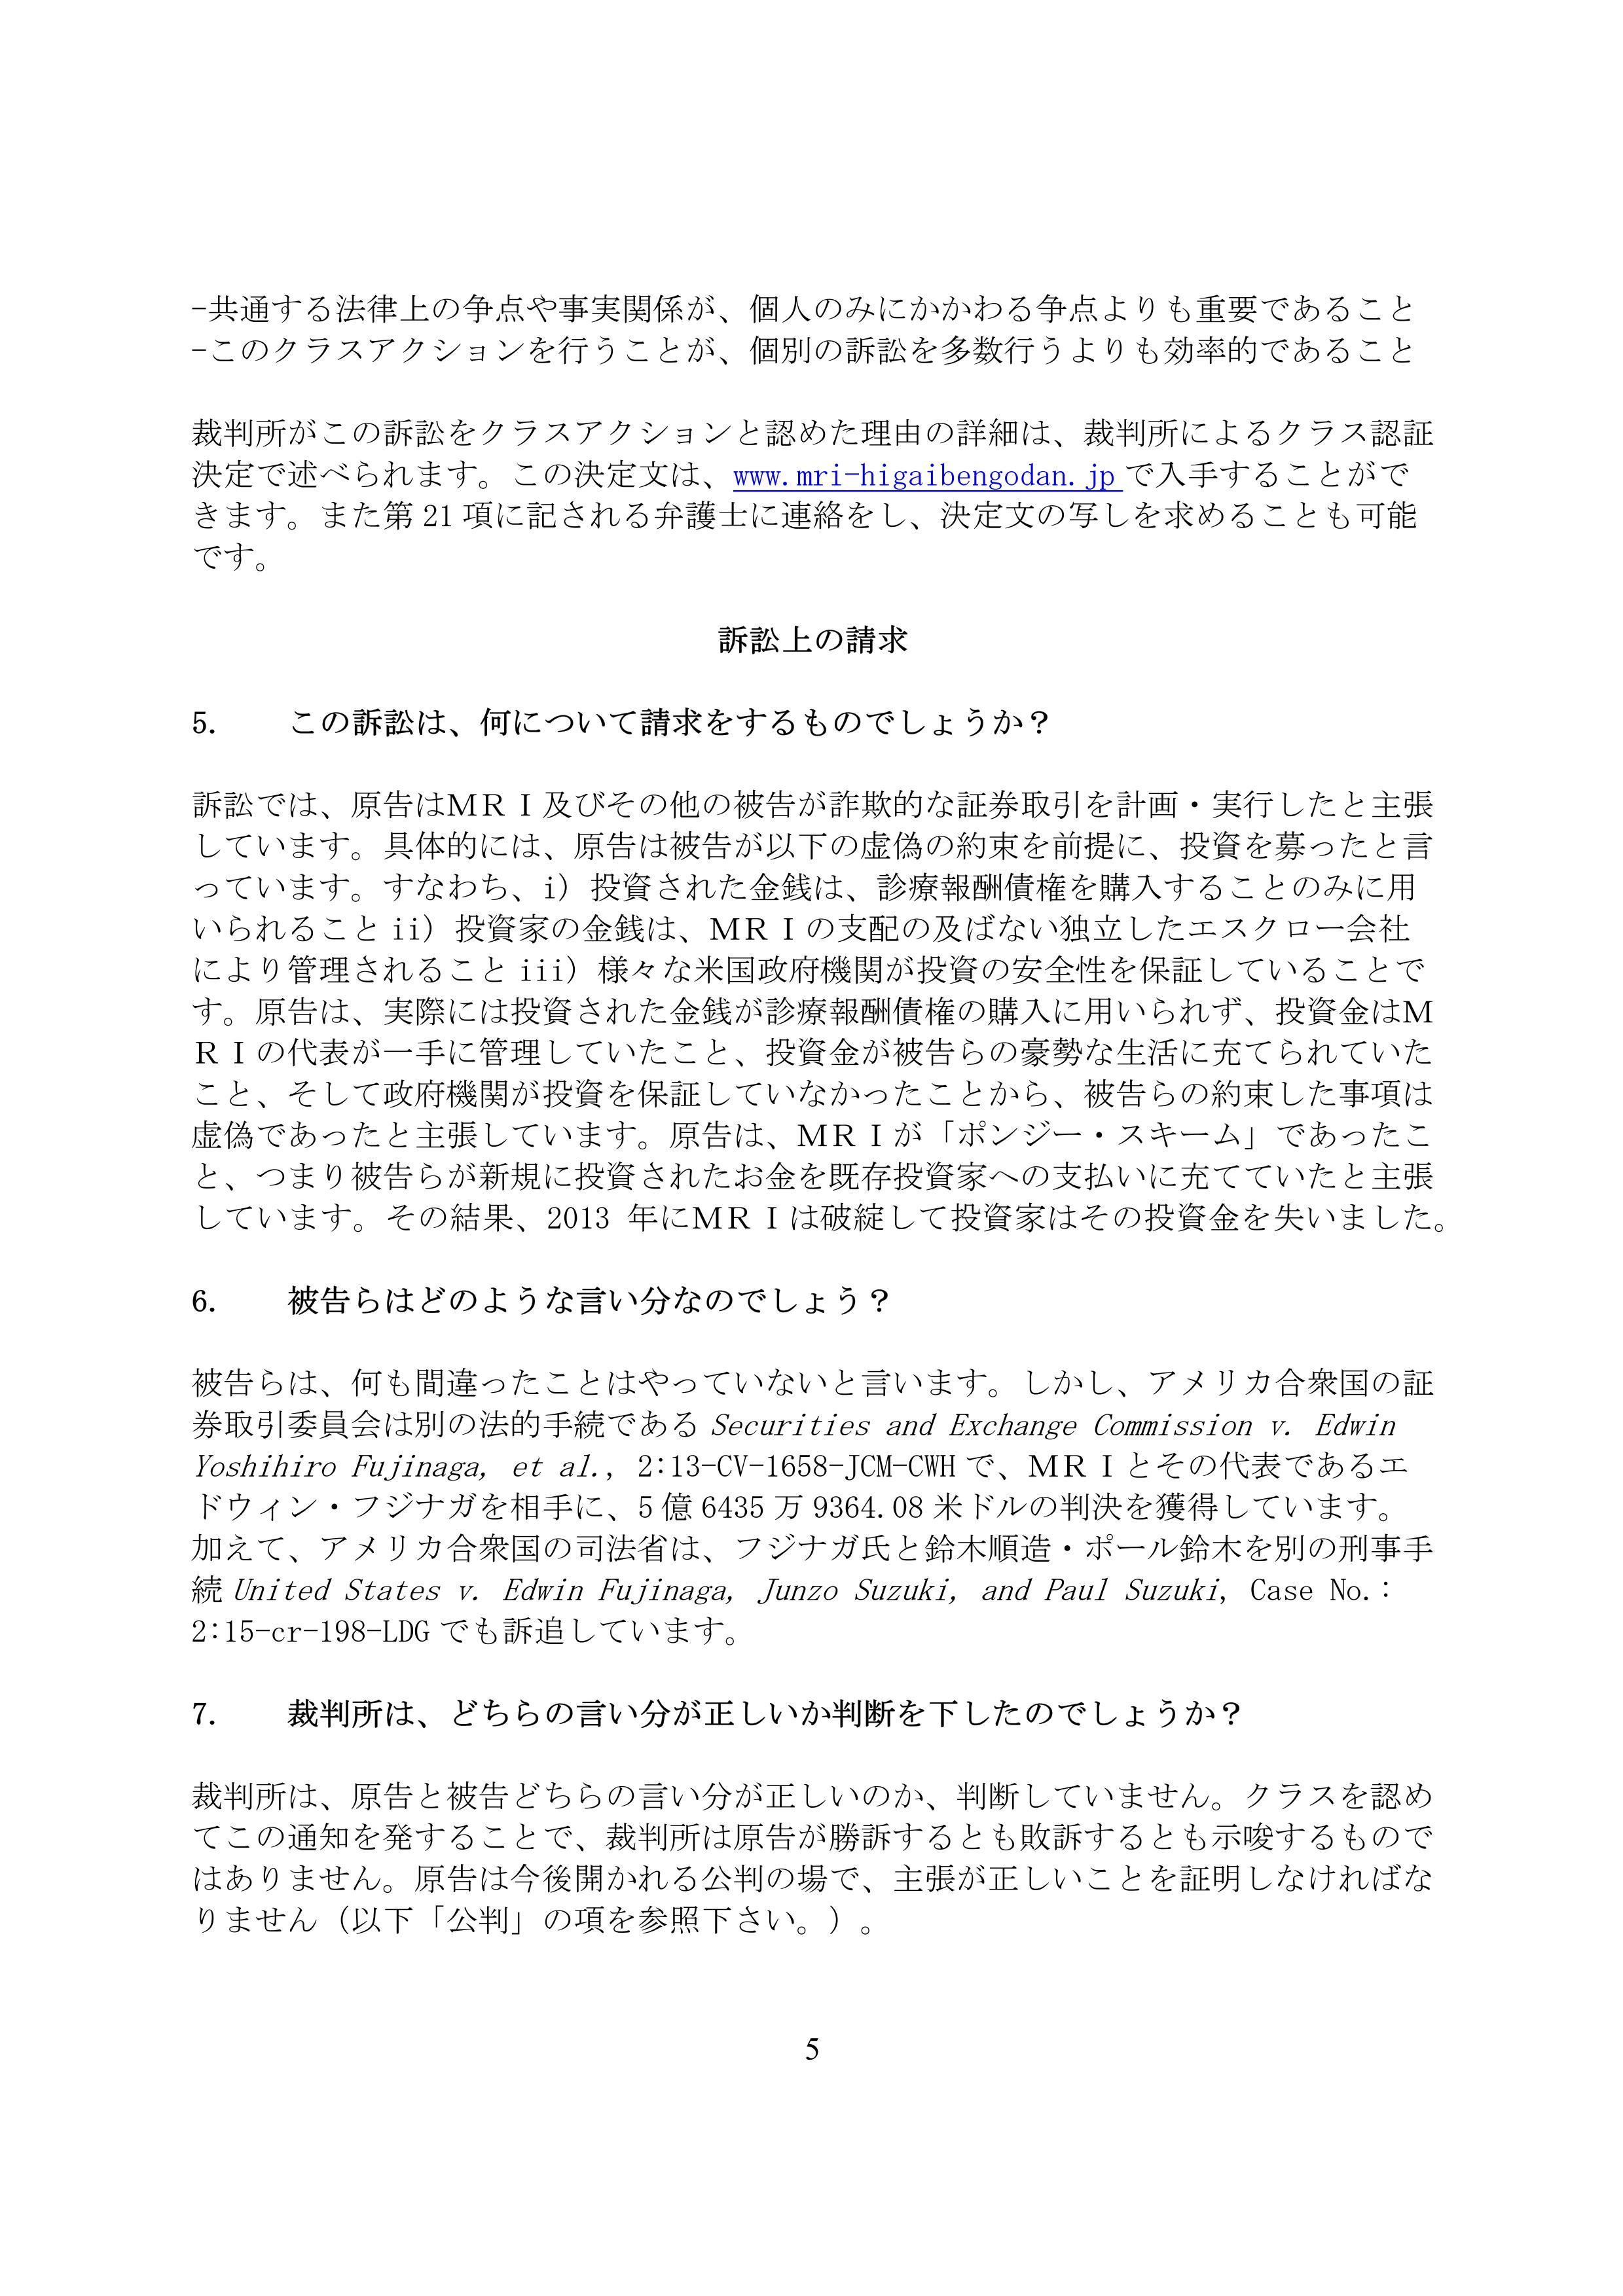 MRI Class Cert Notice_Japanese translation_05